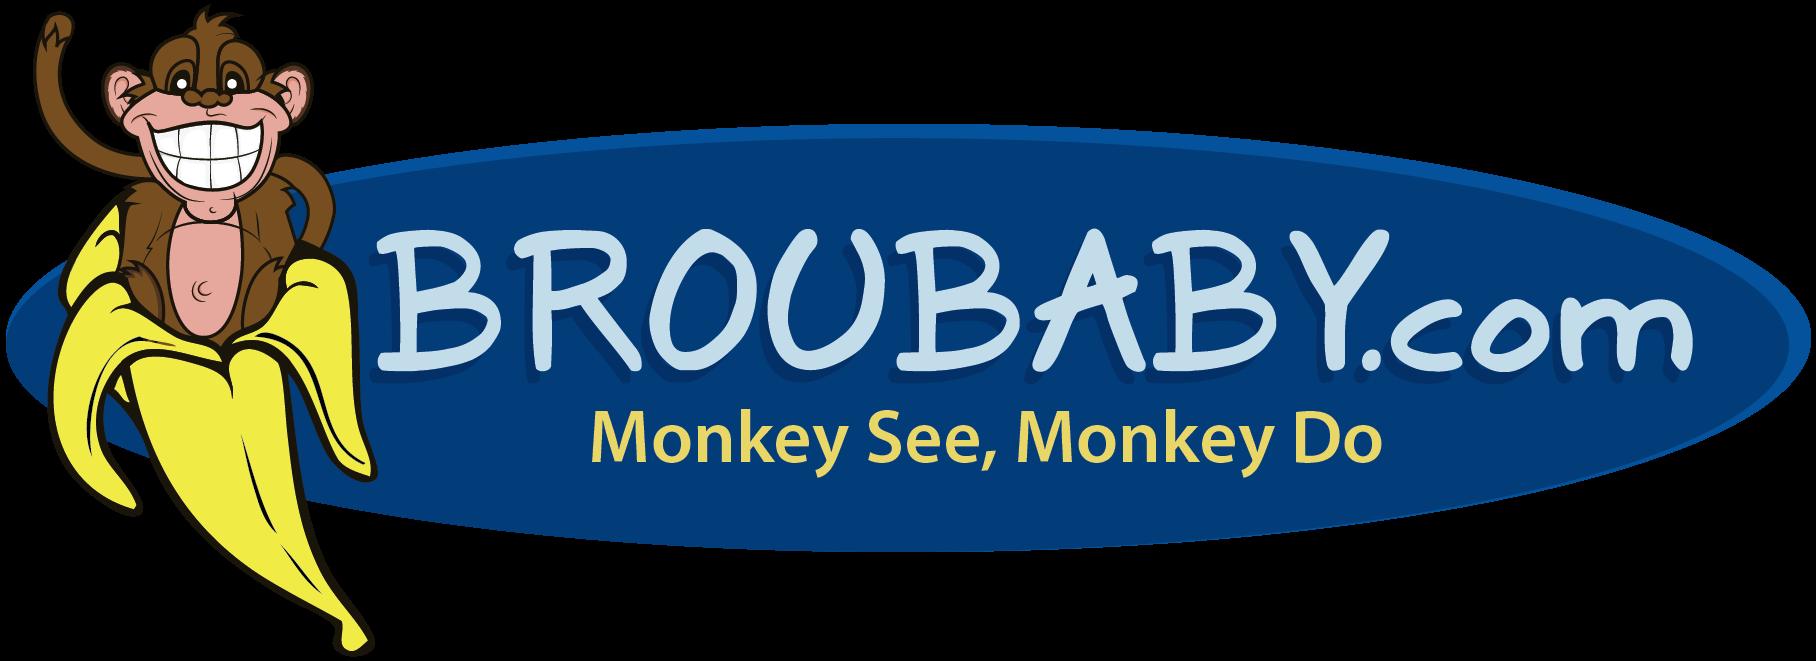 BROUBABY.com